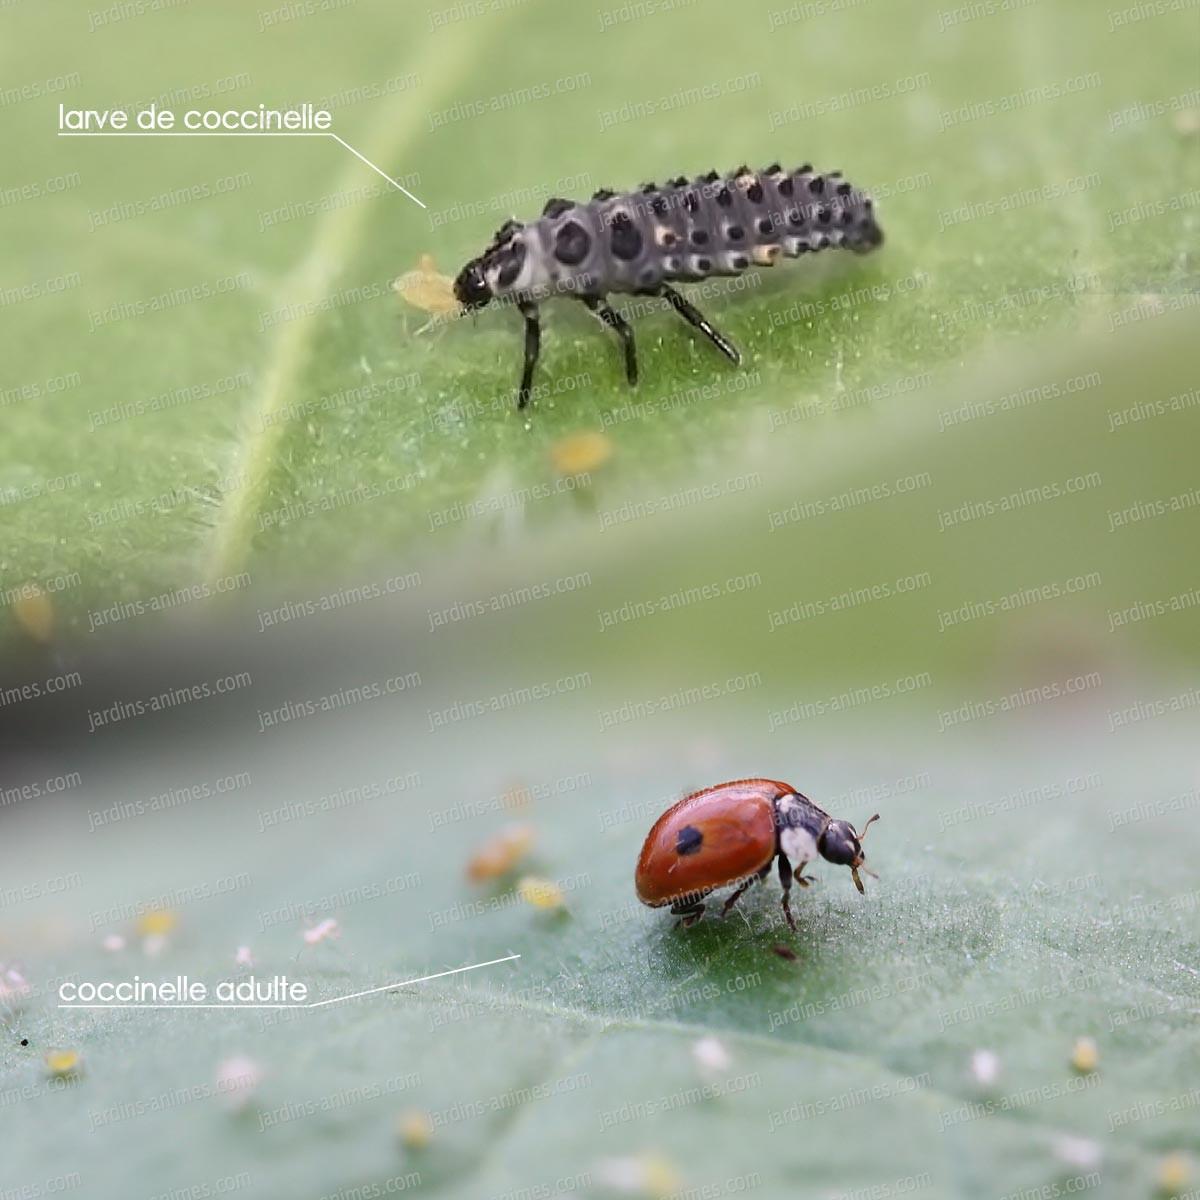 larves de coccinelle europ enne anti pucerons anti pucerons cochenille bio. Black Bedroom Furniture Sets. Home Design Ideas